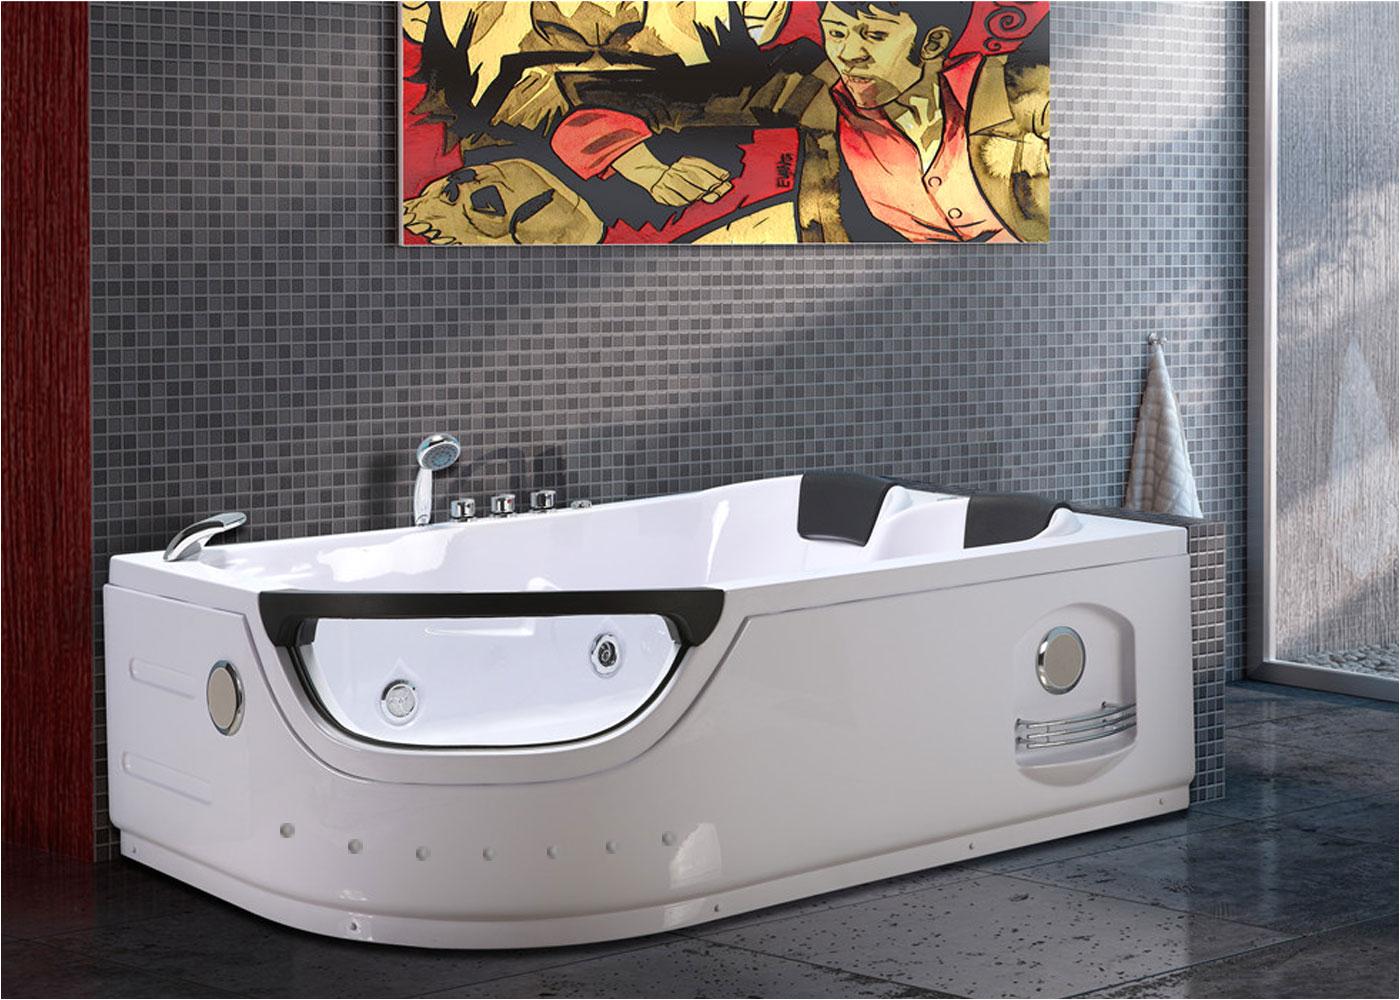 whirpool bathtub hot tub double pump elite